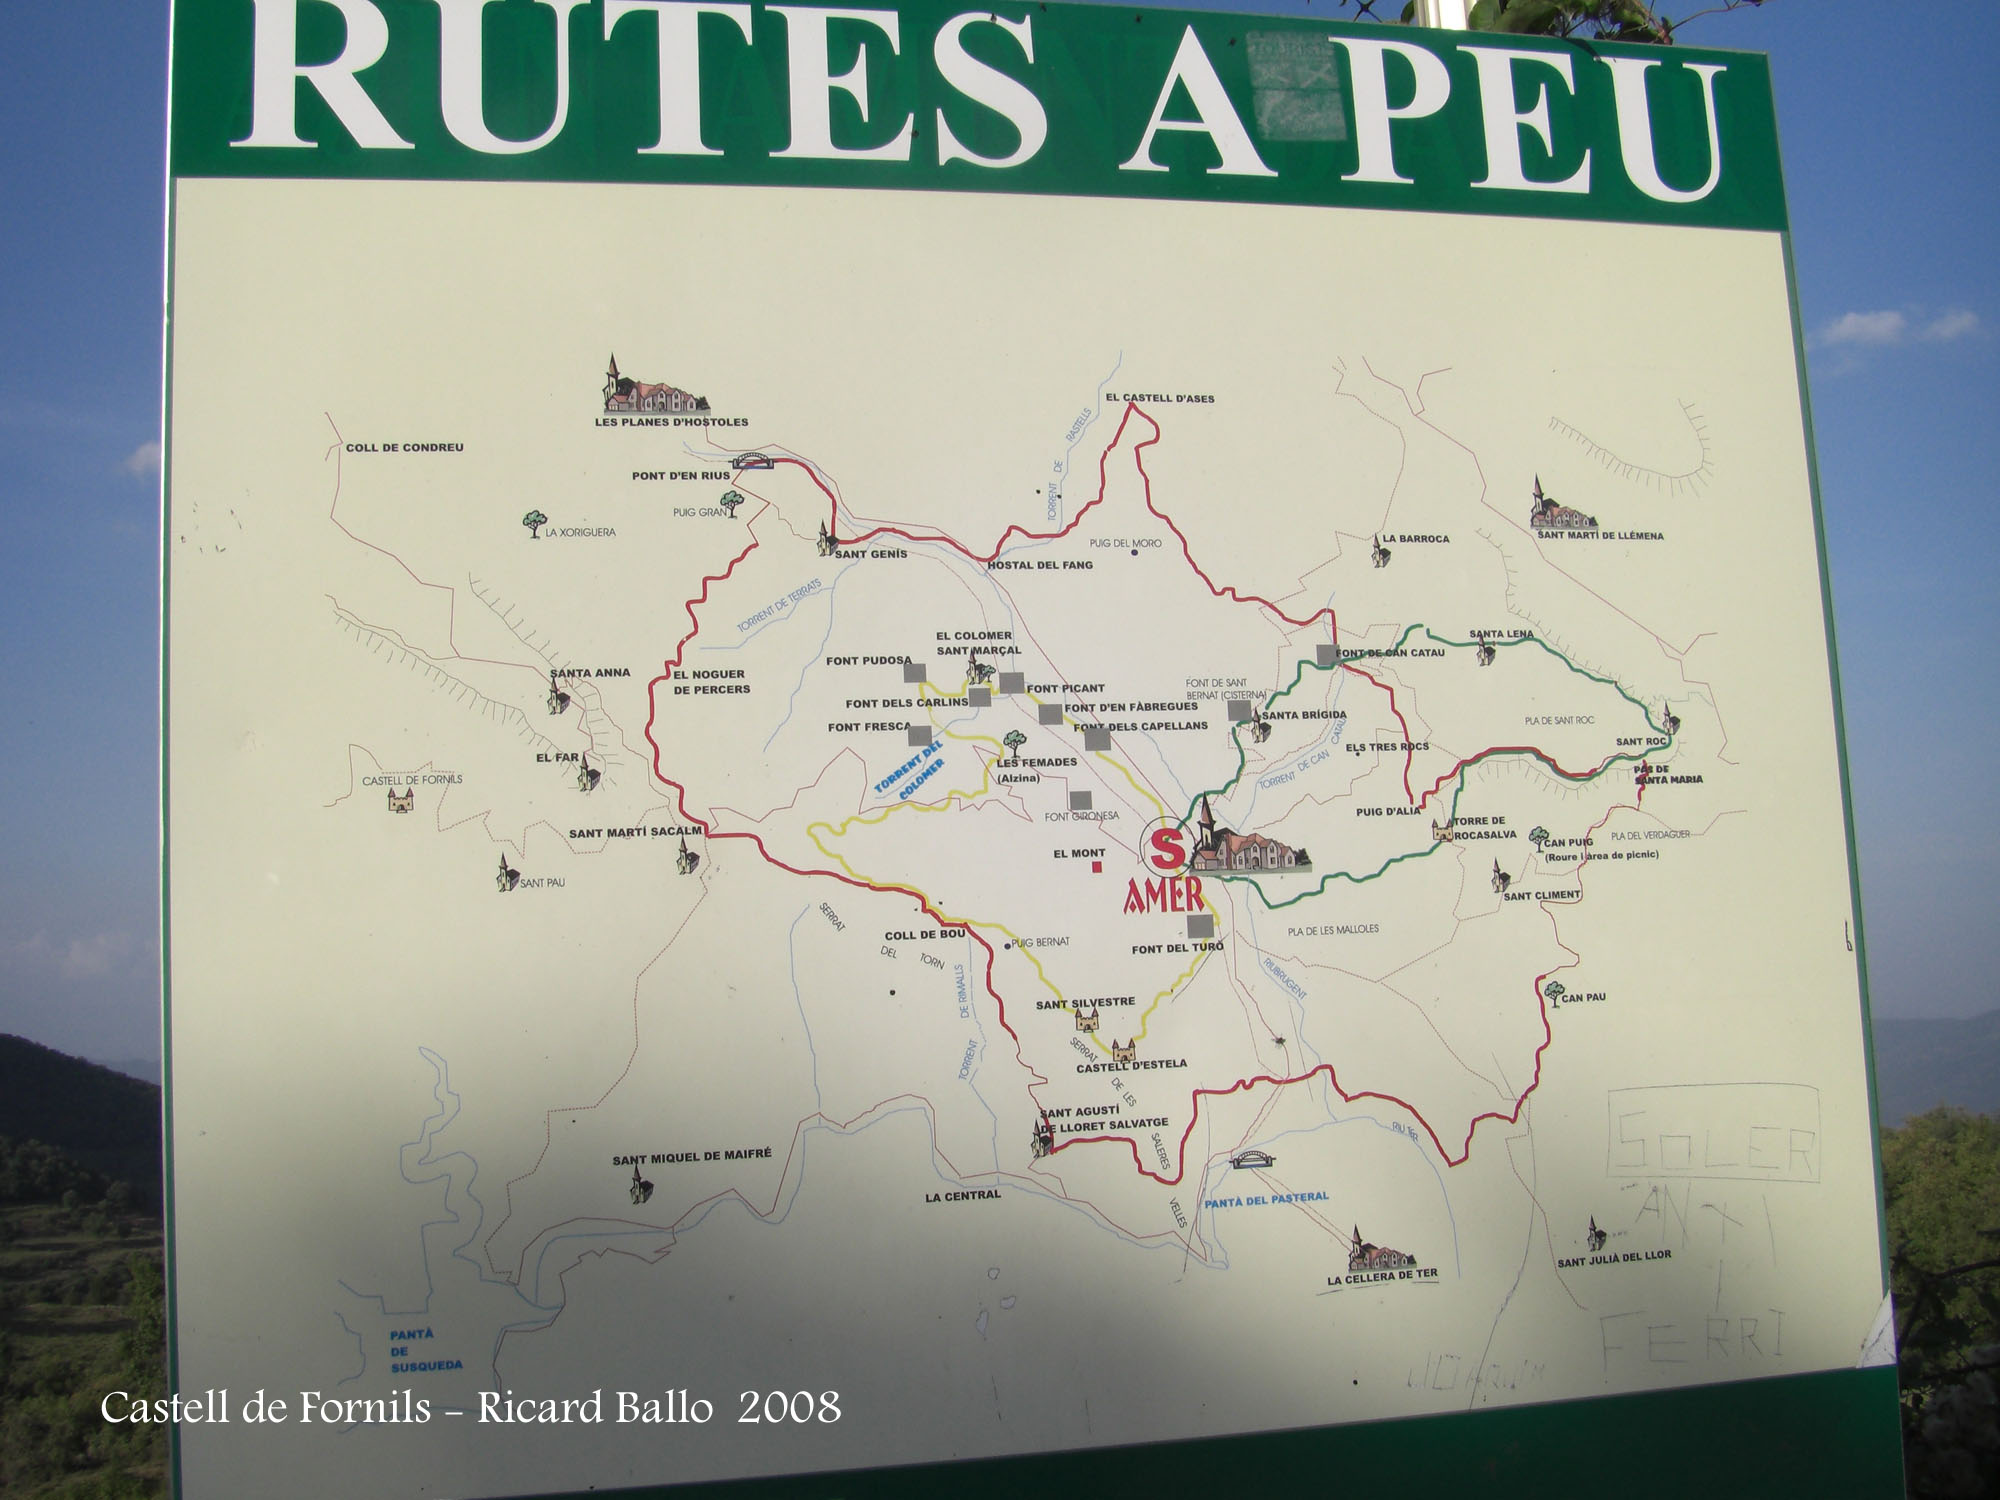 Camí al Castell de Fornils - Cartells informatius